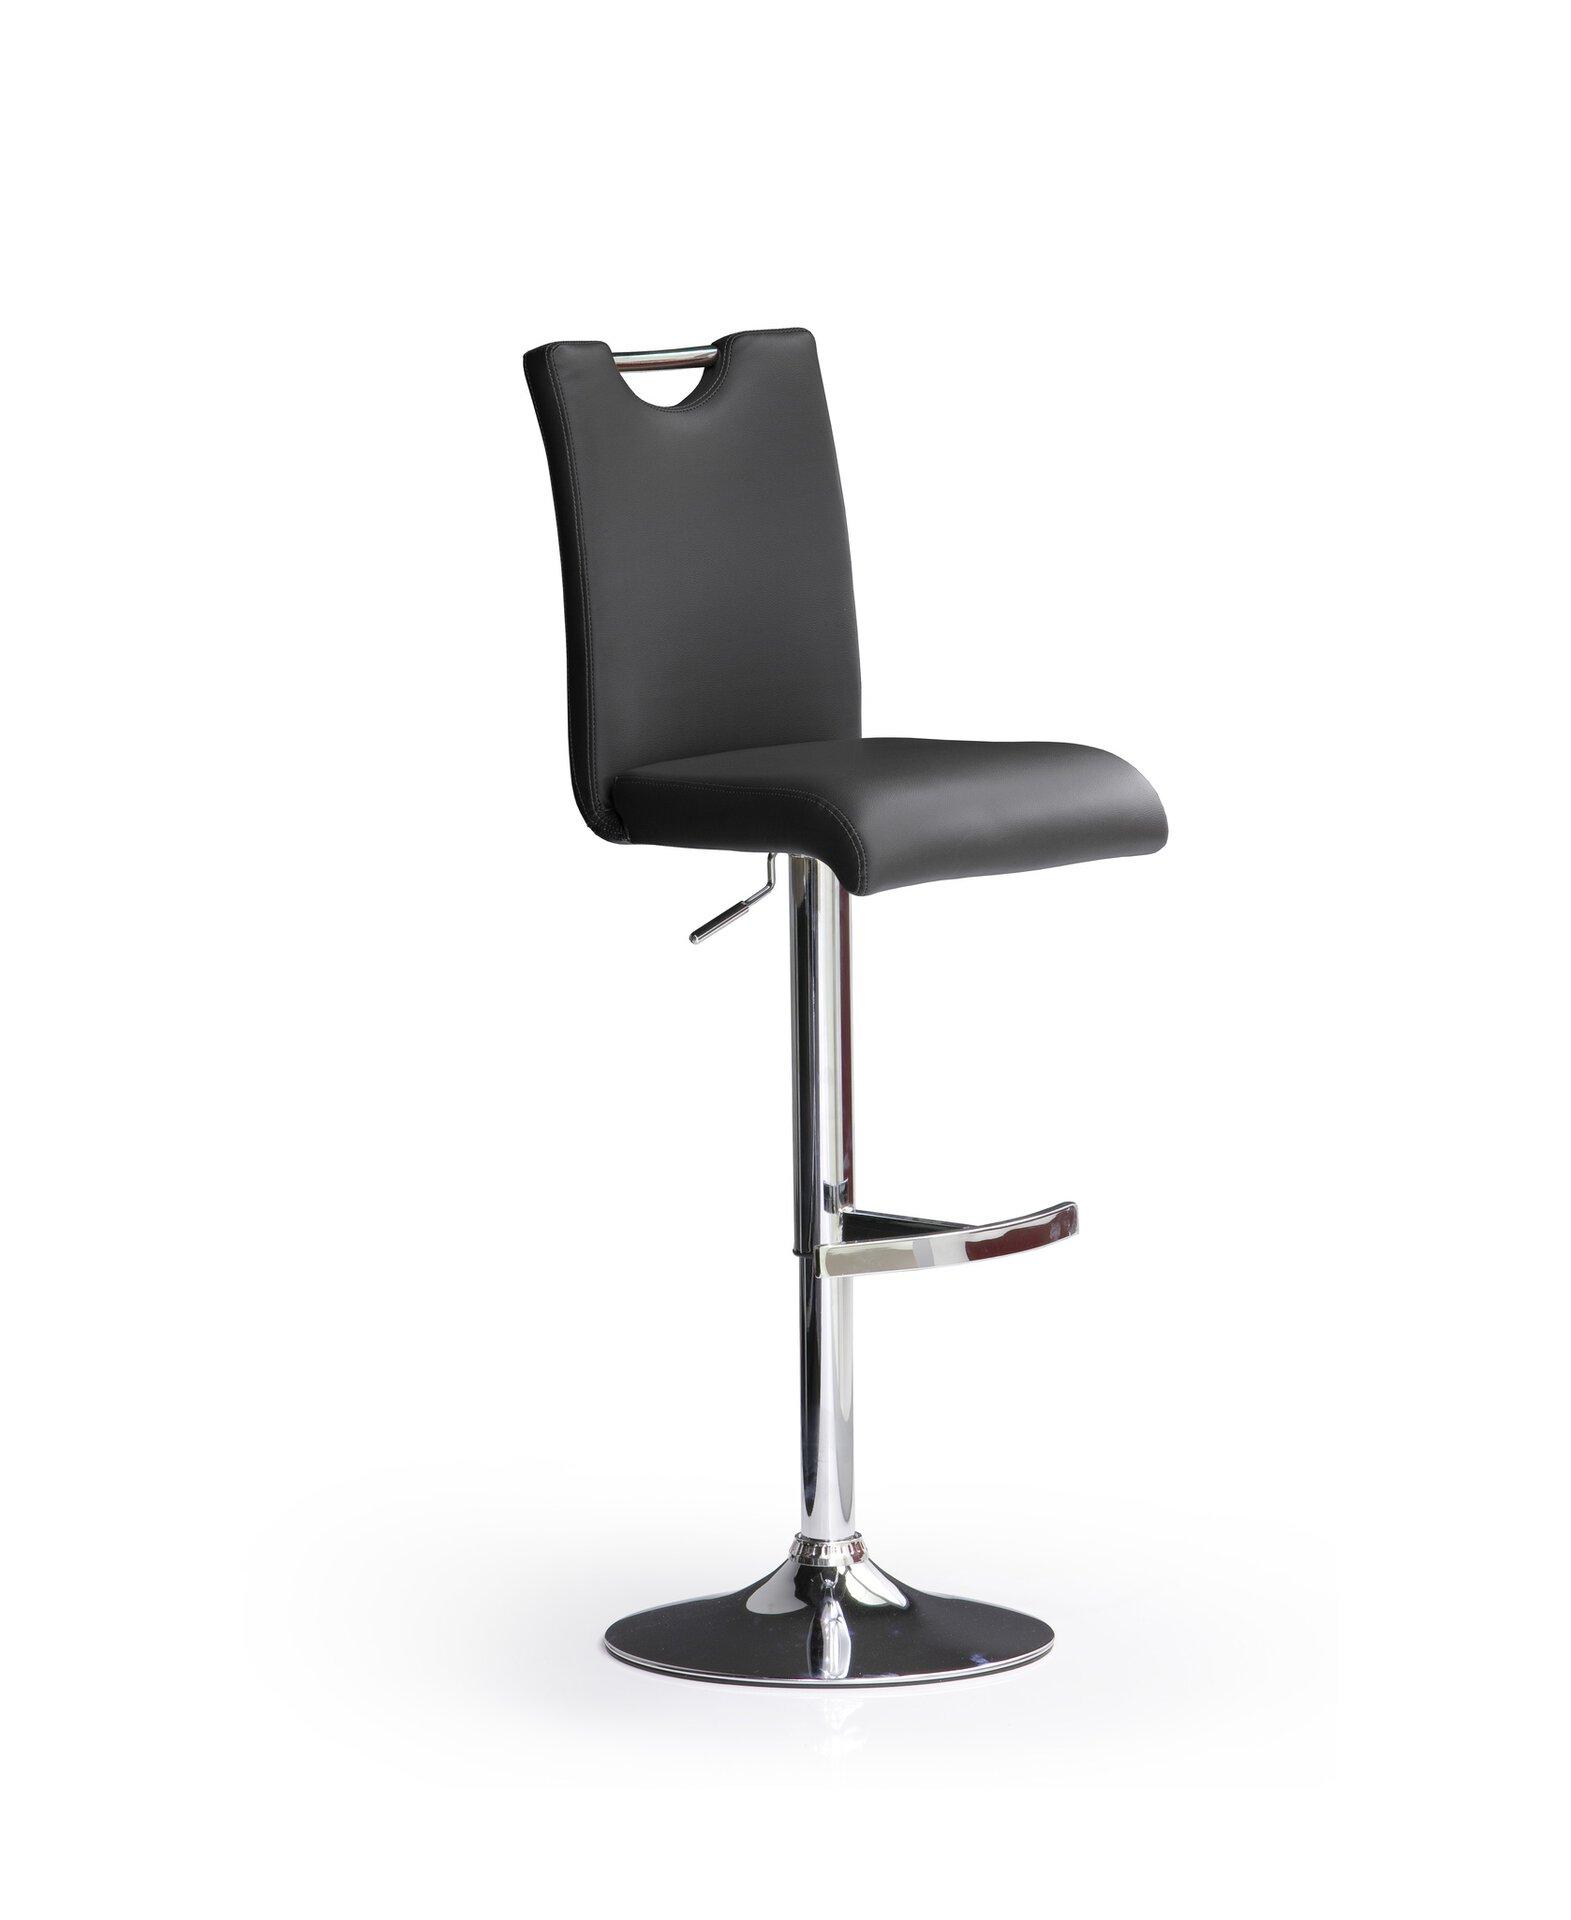 Barstuhl BARDO MCA furniture Textil 52 x 62 x 42 cm